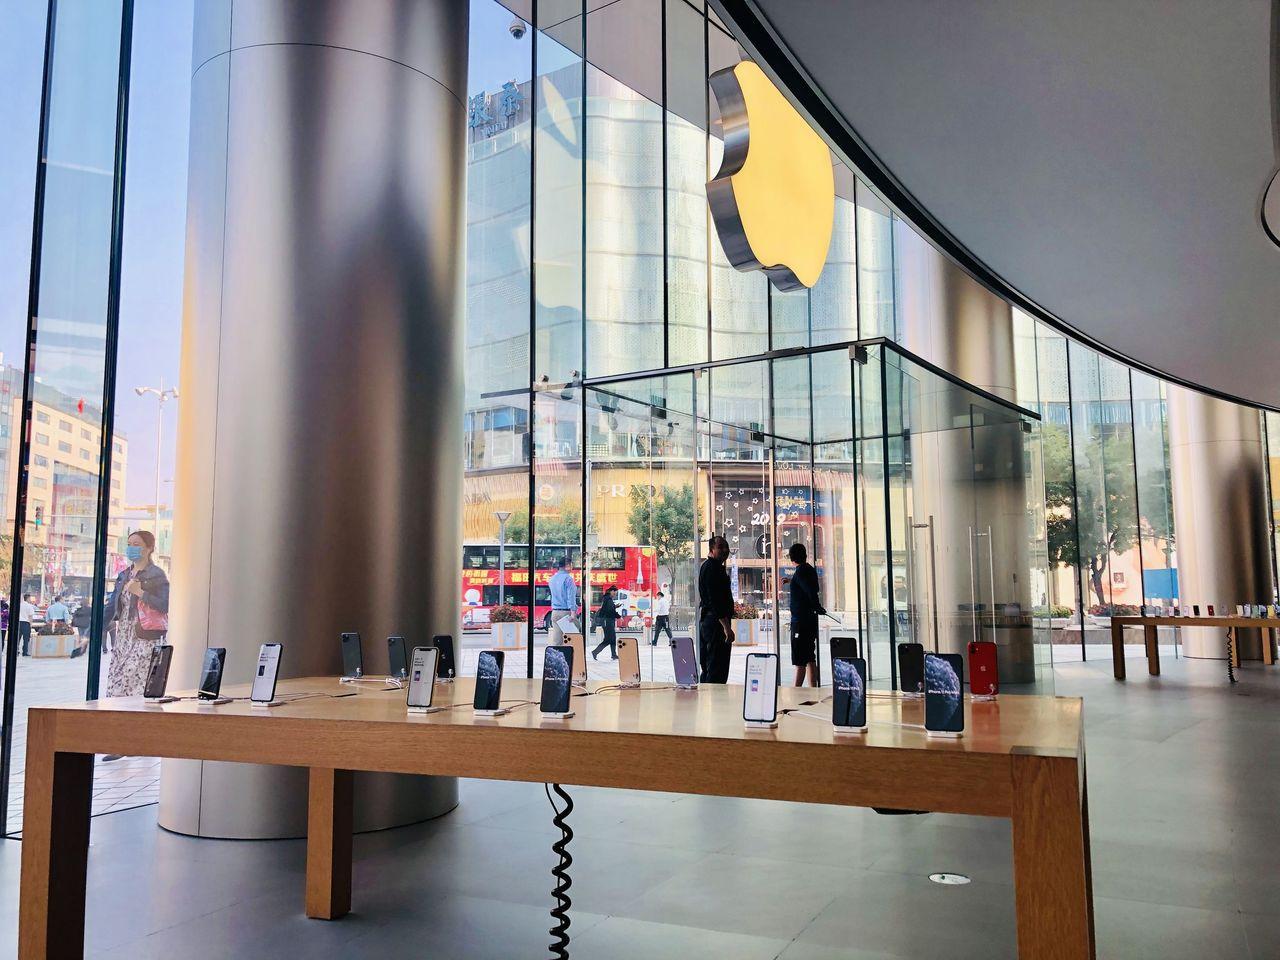 iPhone 11在中首發:未見排長龍首位顧客選了綠色 取材自新京報